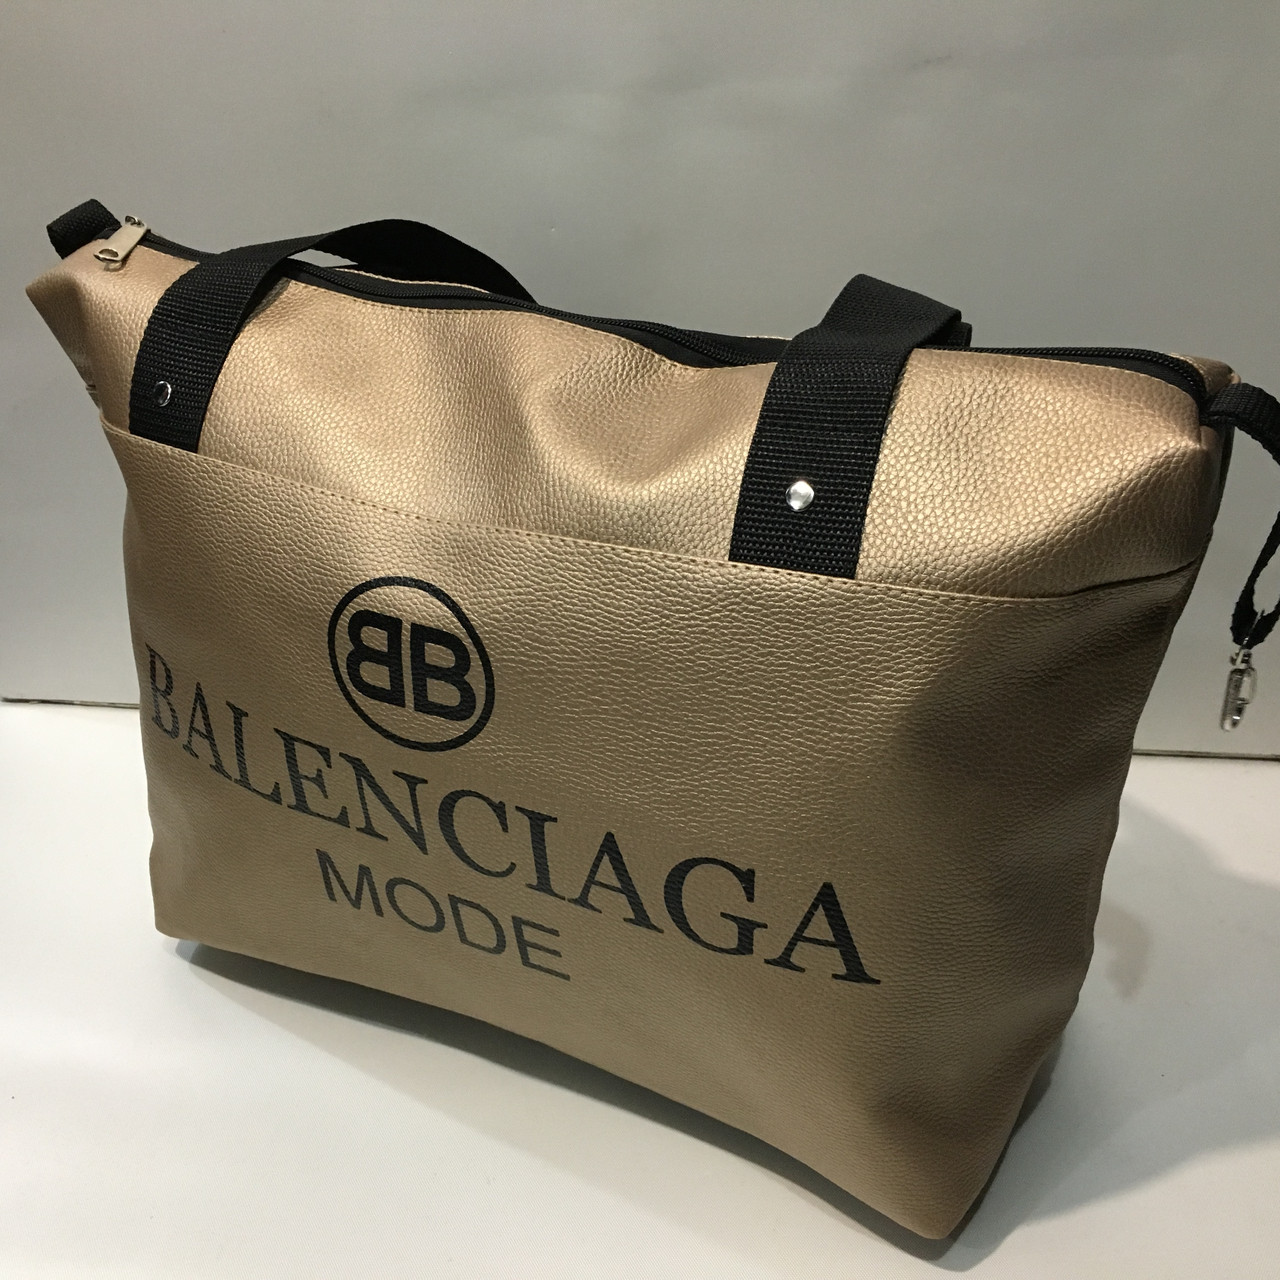 3abc47d55e9b Спортивная сумка BALENCIAGA MODE оптом: продажа, цена в Харькове ...